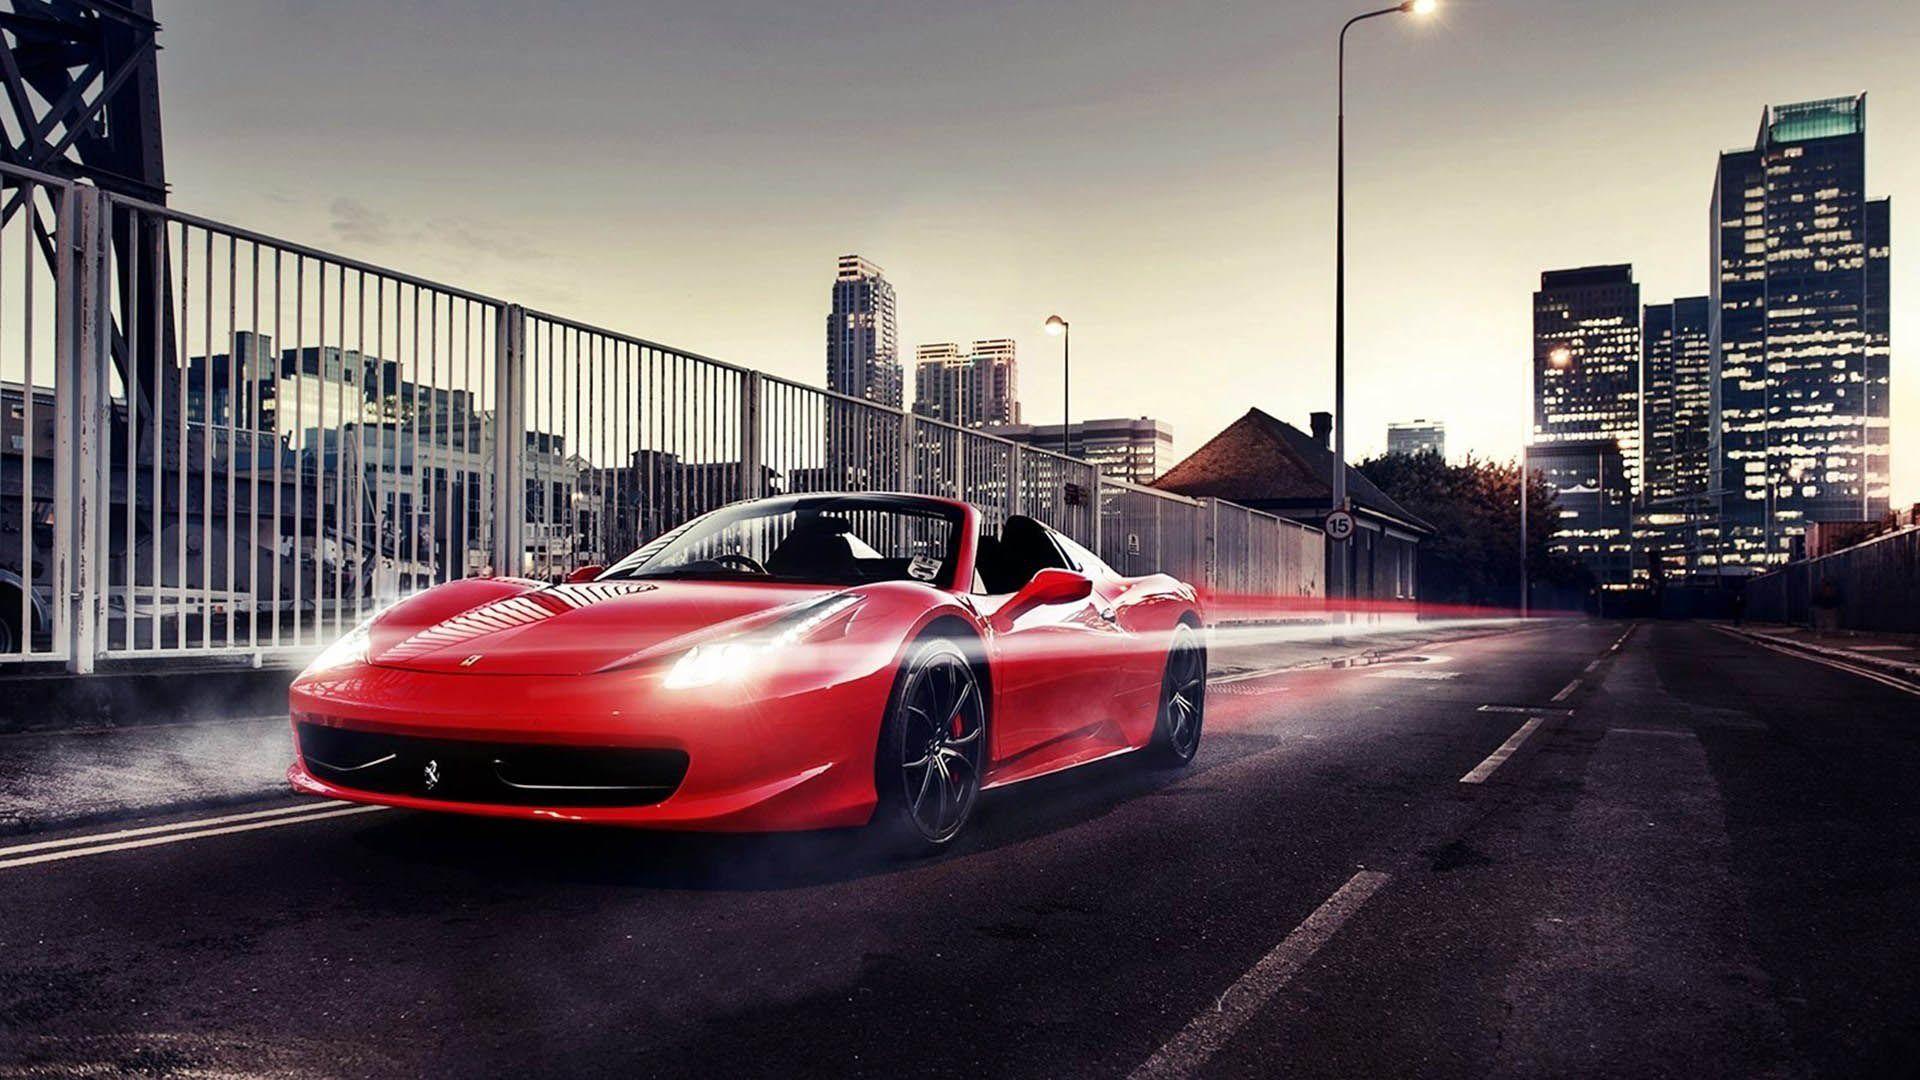 Ferrari 458 Spider Goes Fast In The City 1920x1080 Full Hd 16 9 Ferrari 458